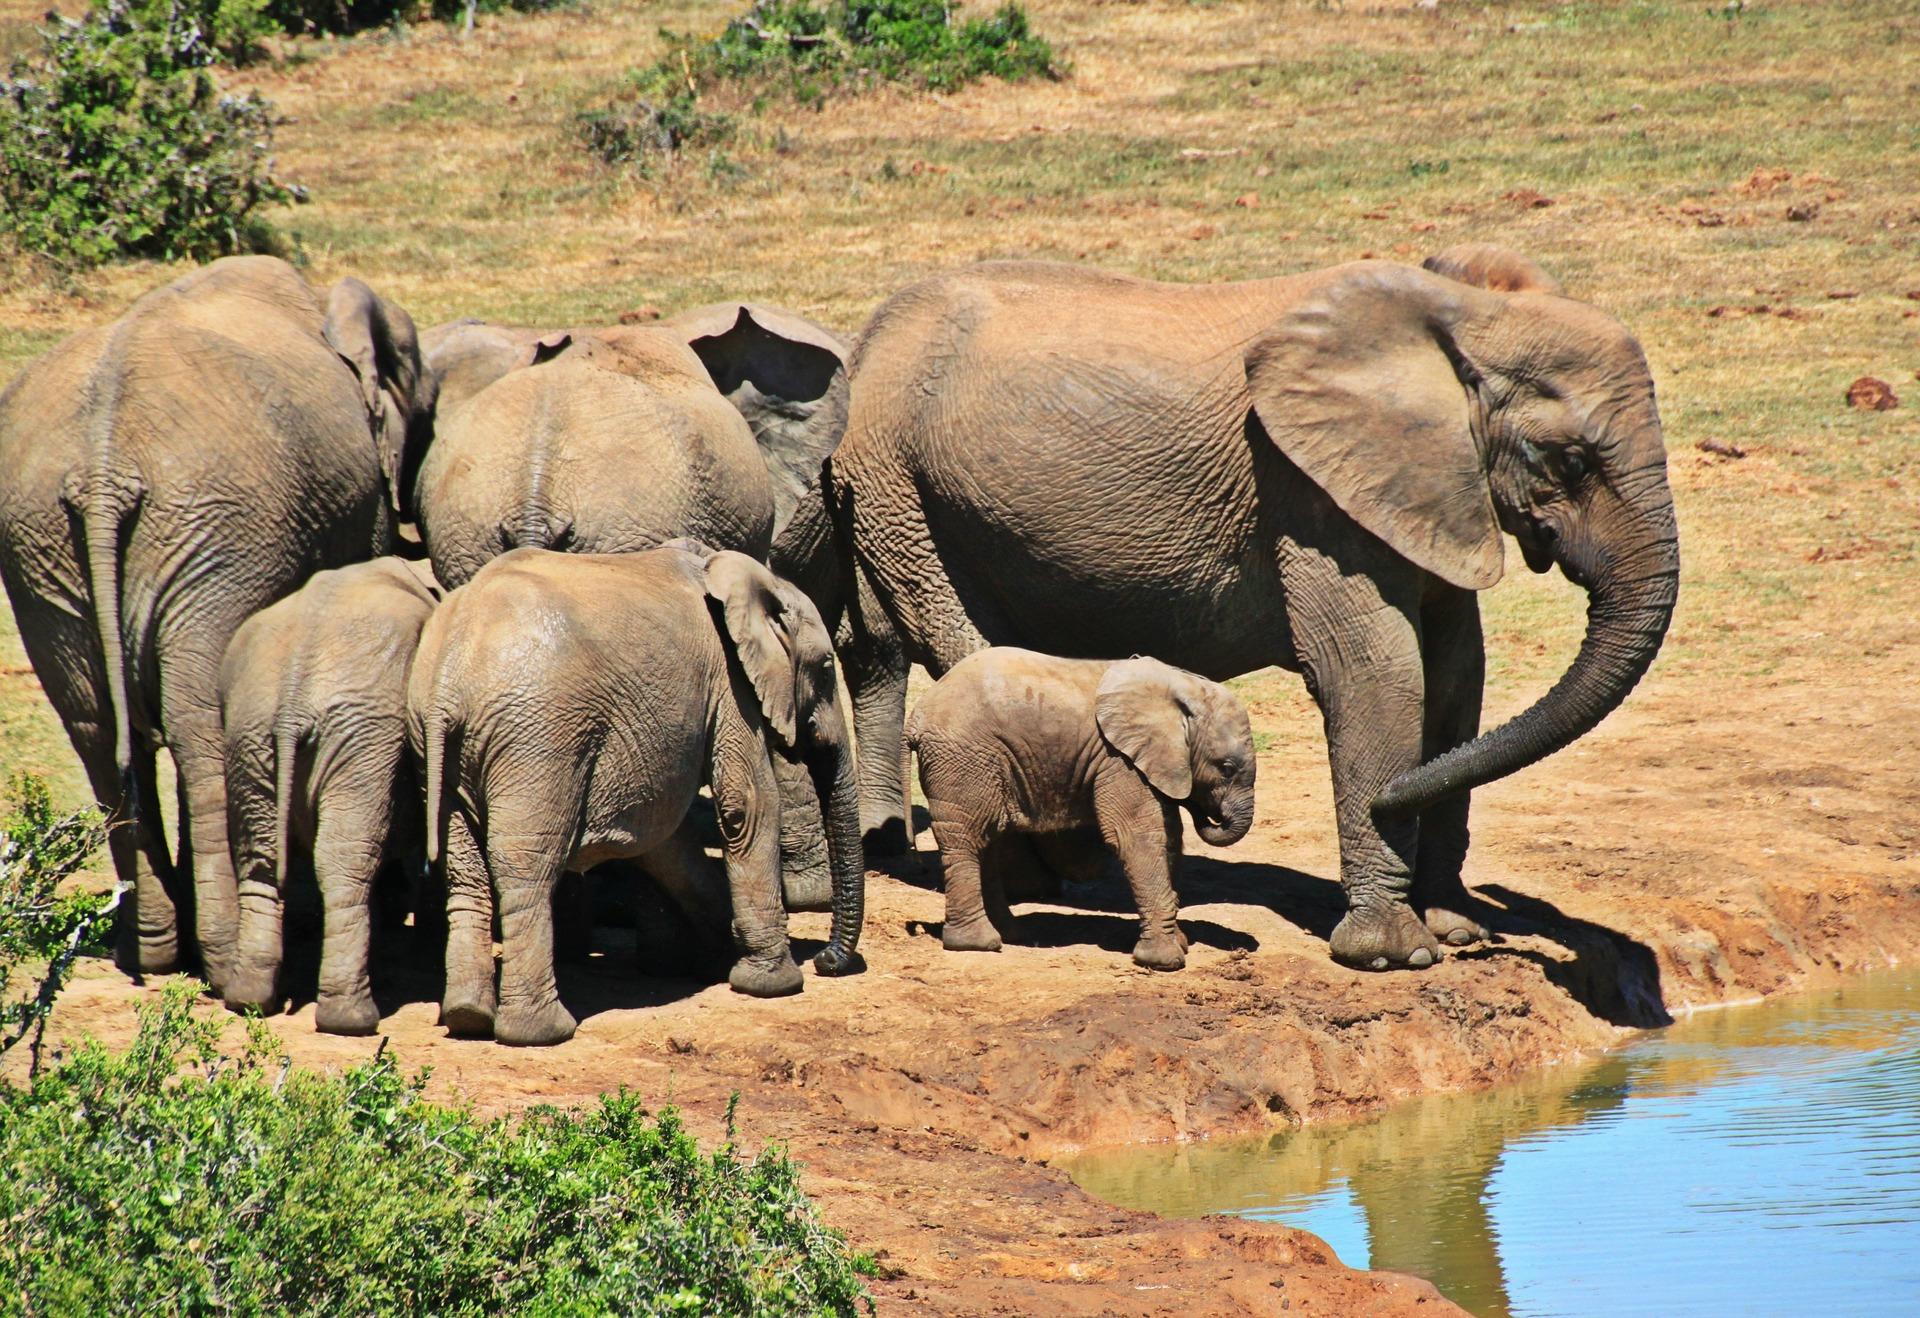 Group of Elephants, Nature, Wild, Group, Elephant, HQ Photo